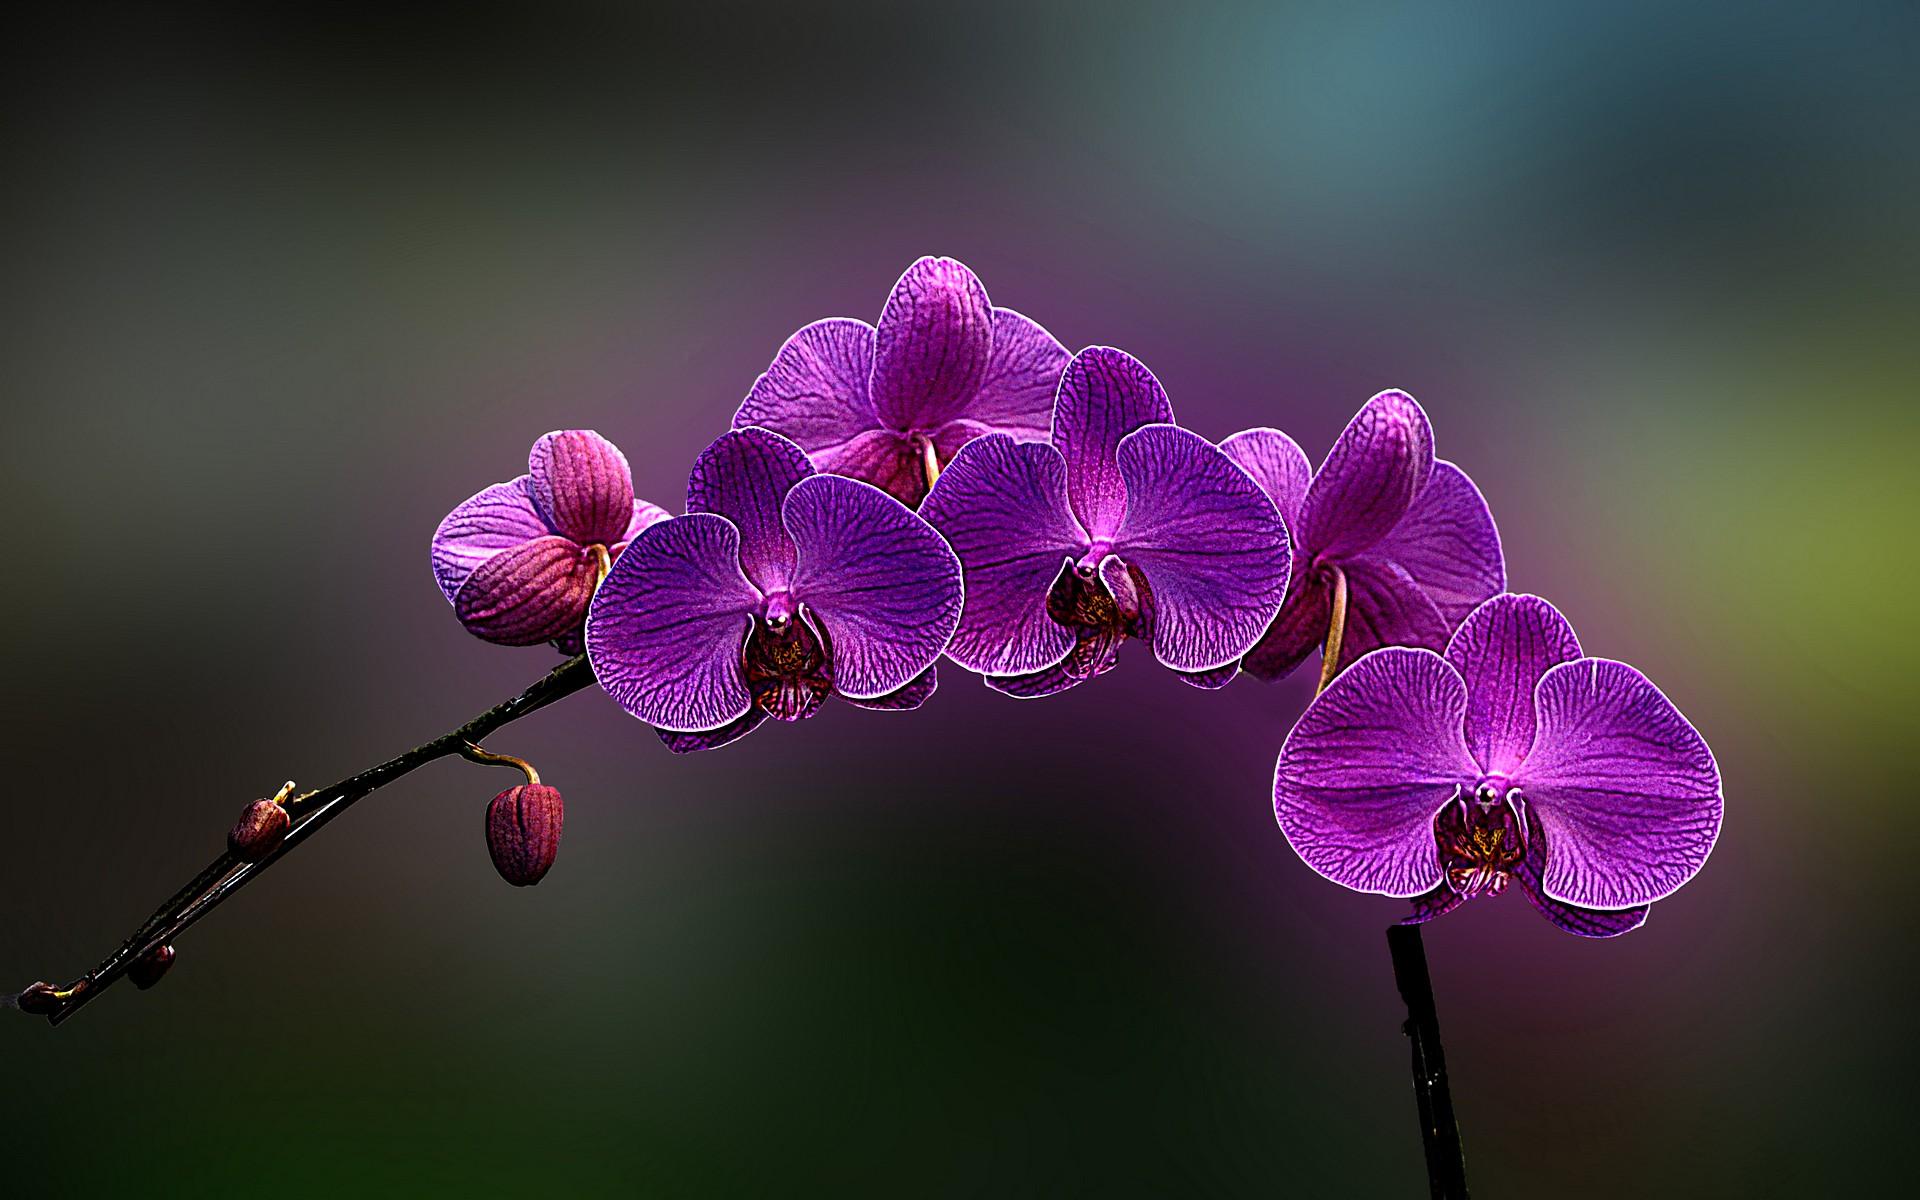 orchid flower wallpaper  wallpapersafari, Beautiful flower